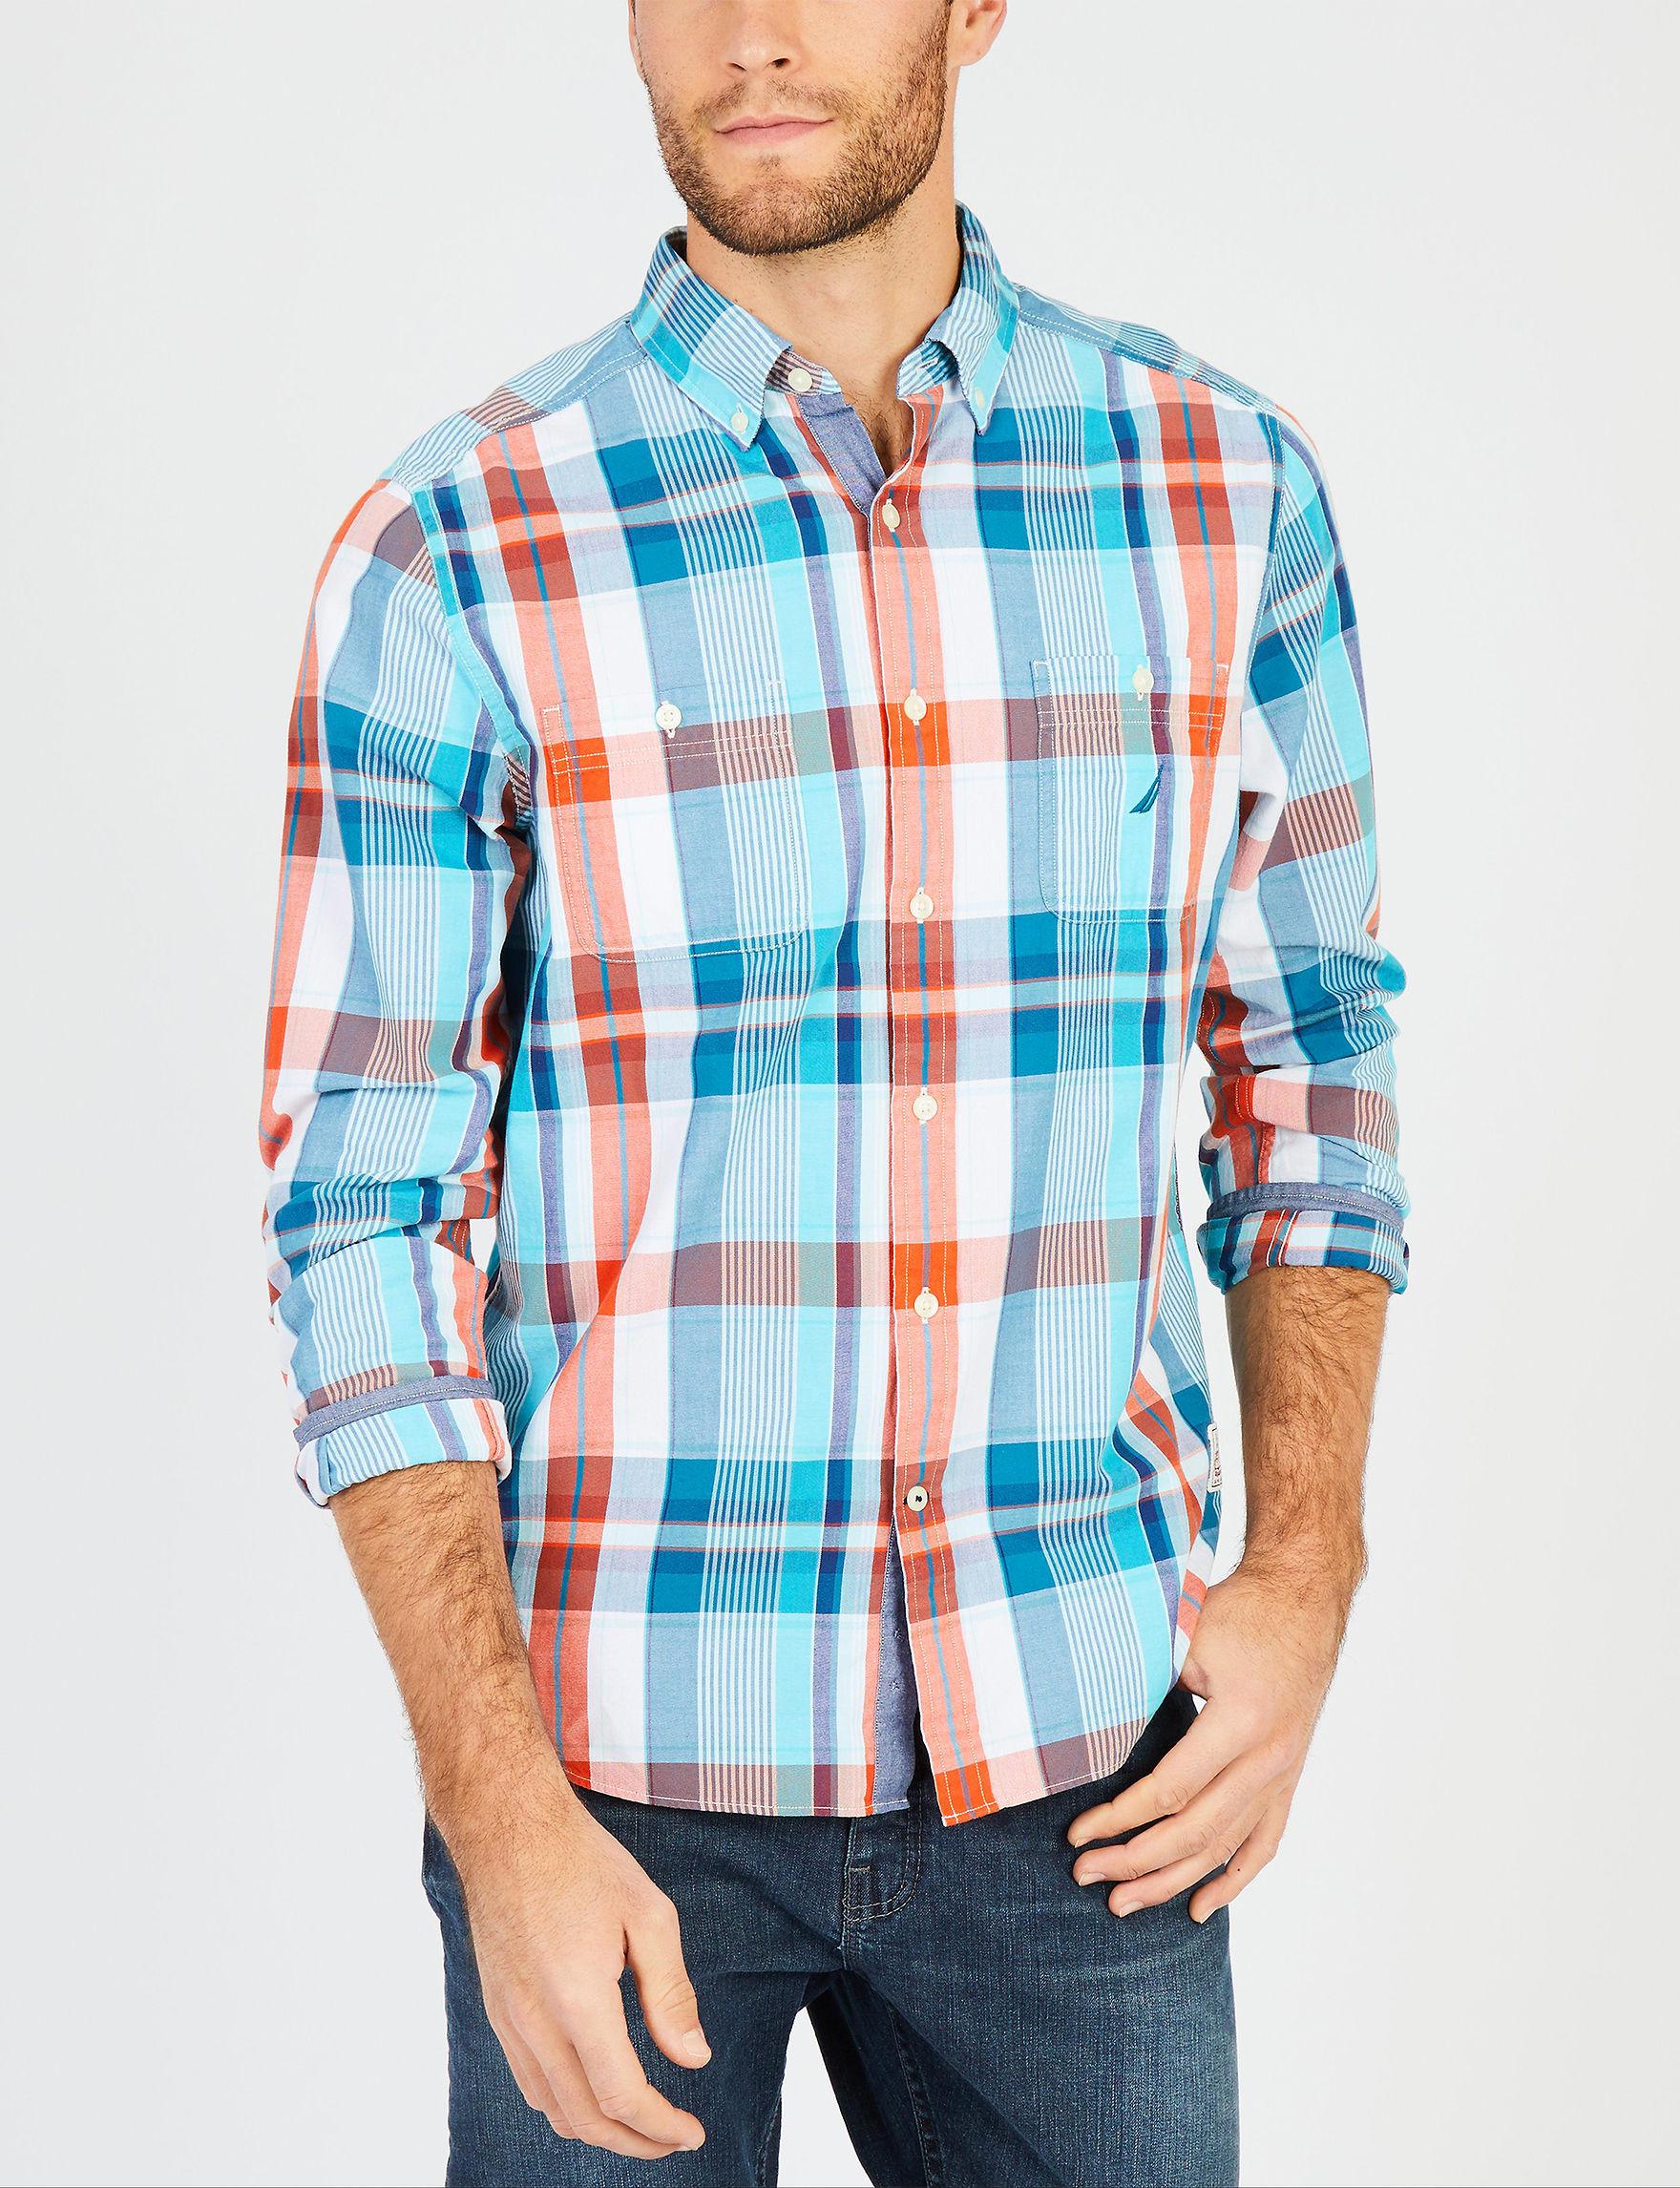 Nautica Blue / Orange Casual Button Down Shirts